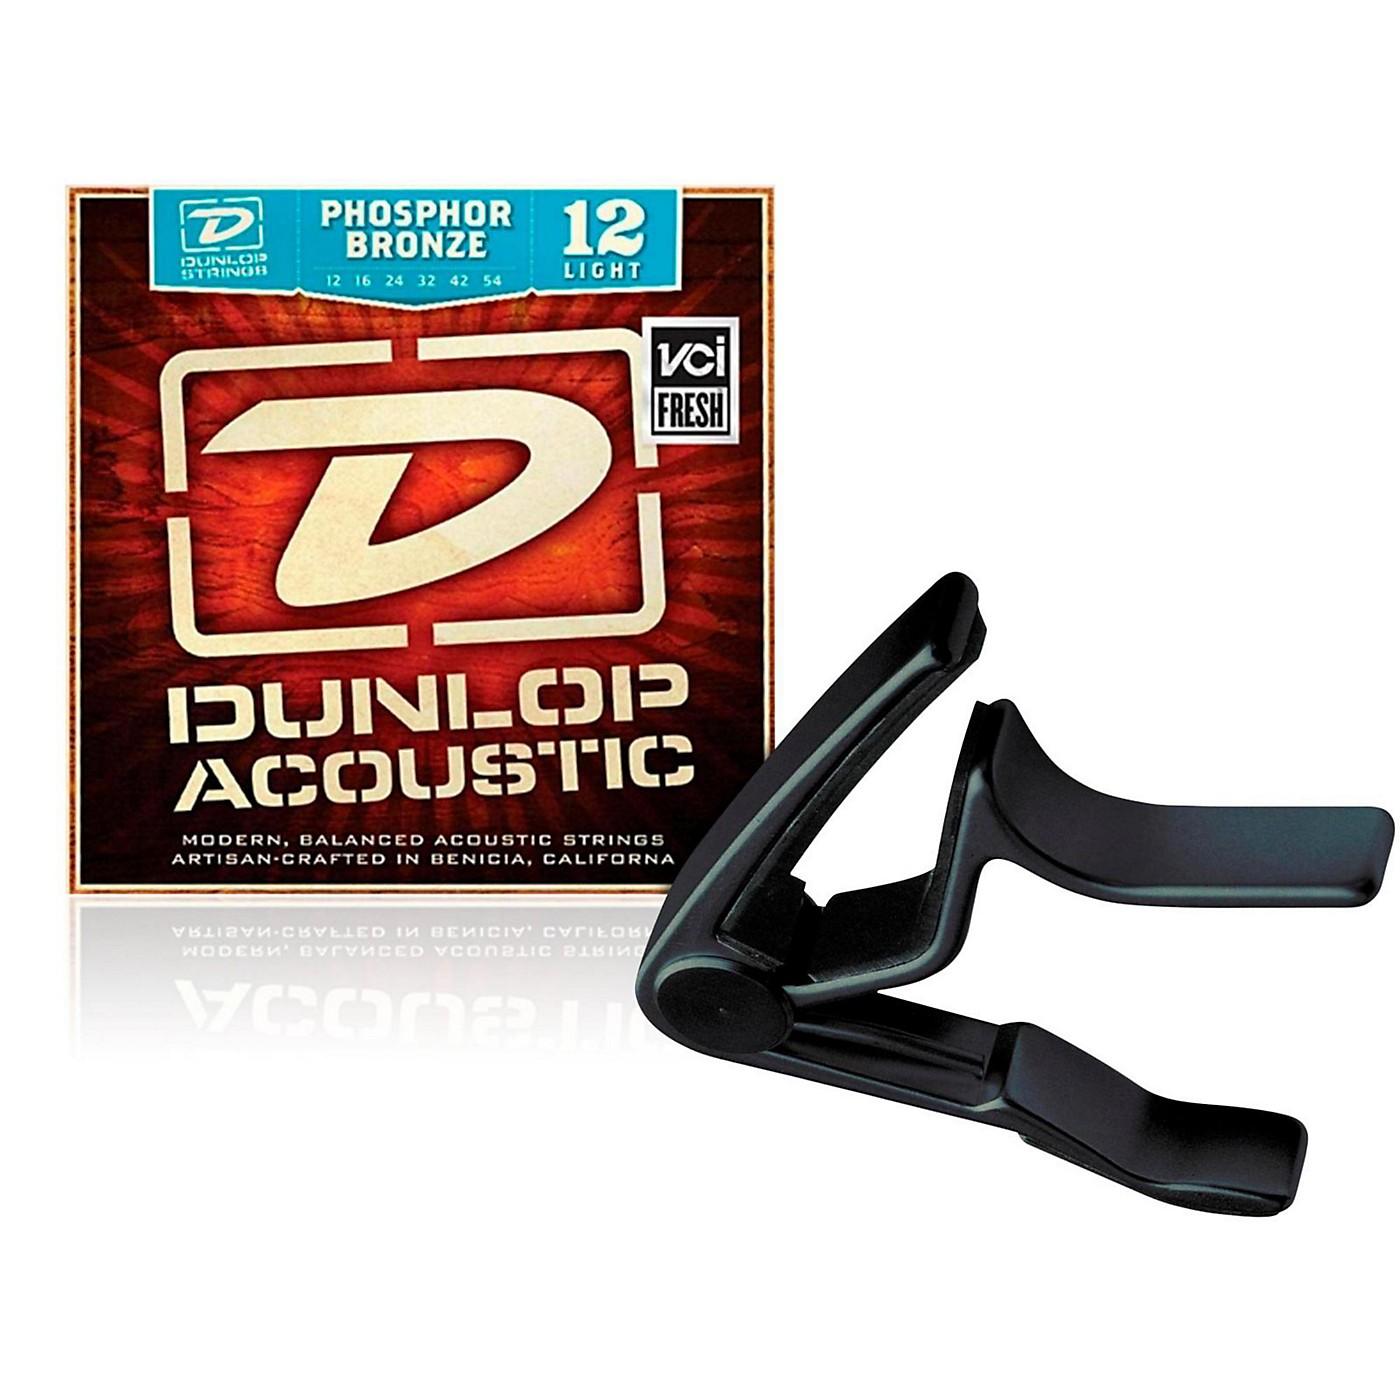 Dunlop Trigger Curved Black Capo andPhosphor Bronze Light Acoustic Guitar Strings thumbnail